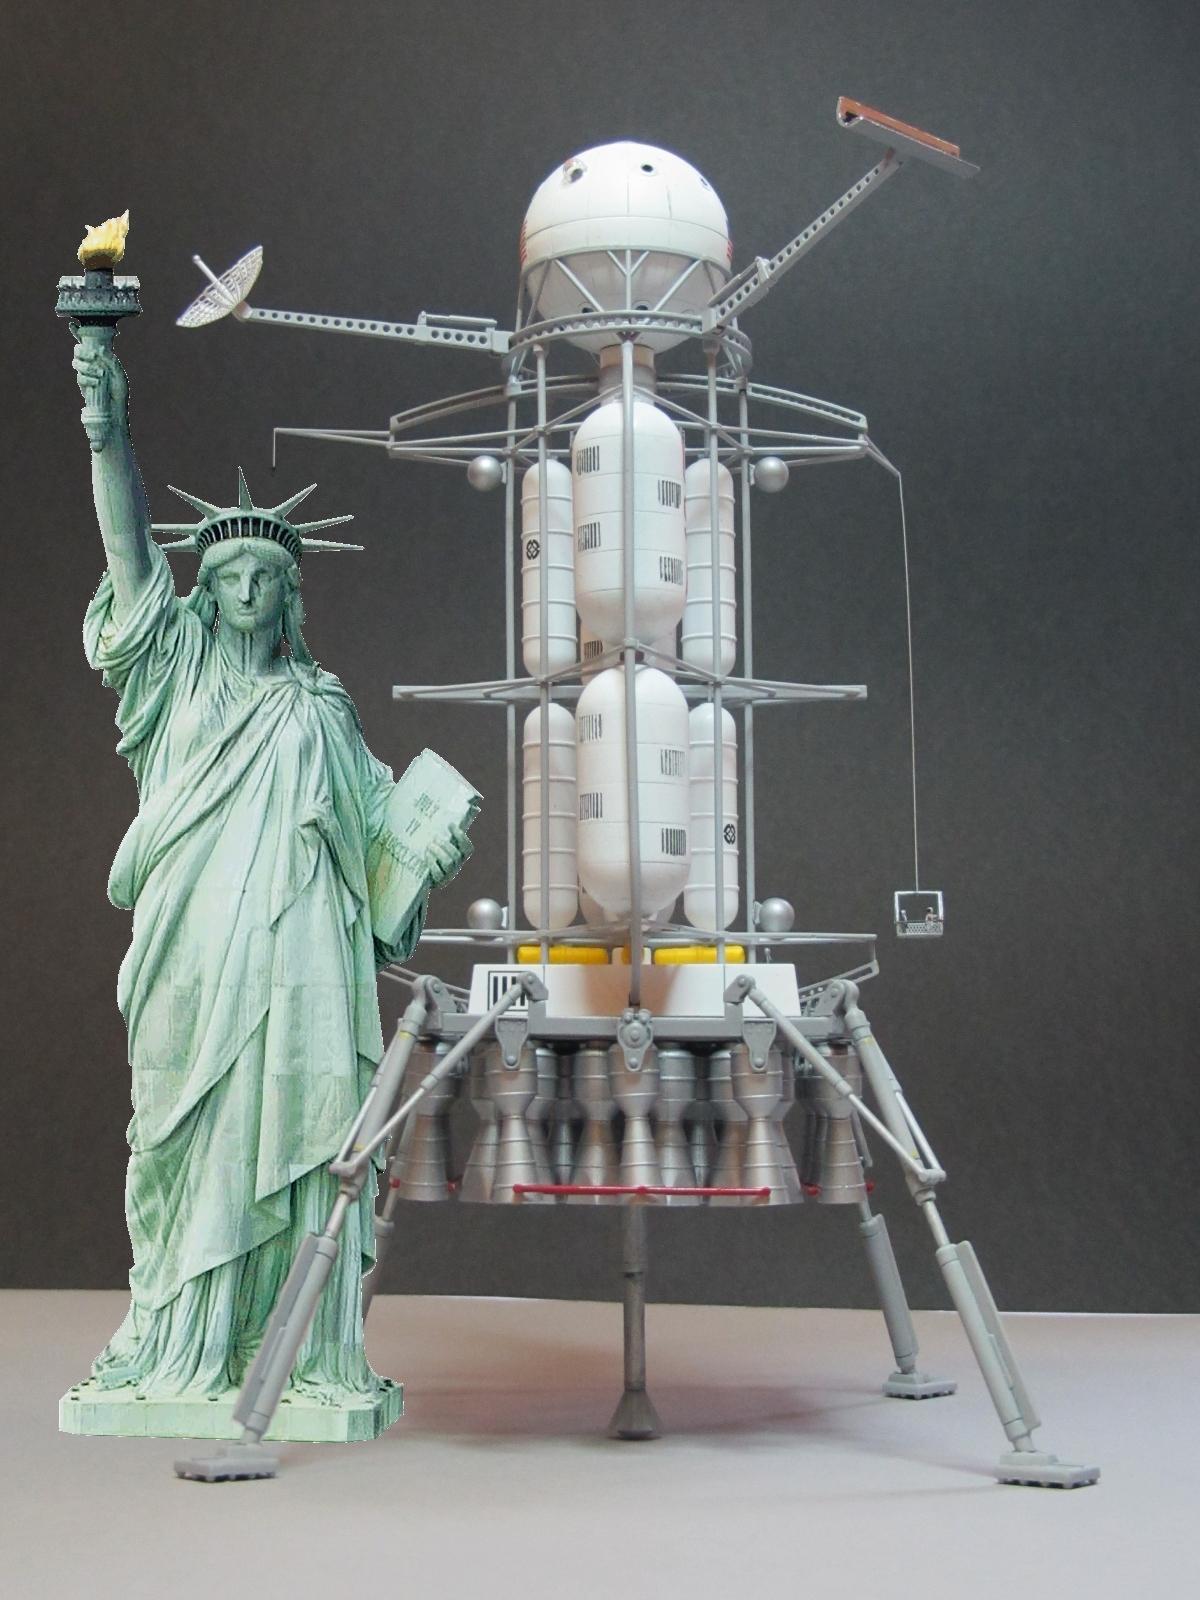 Click image for larger version.  Name:liberty lander.jpg Views:18 Size:1.04 MB ID:24561